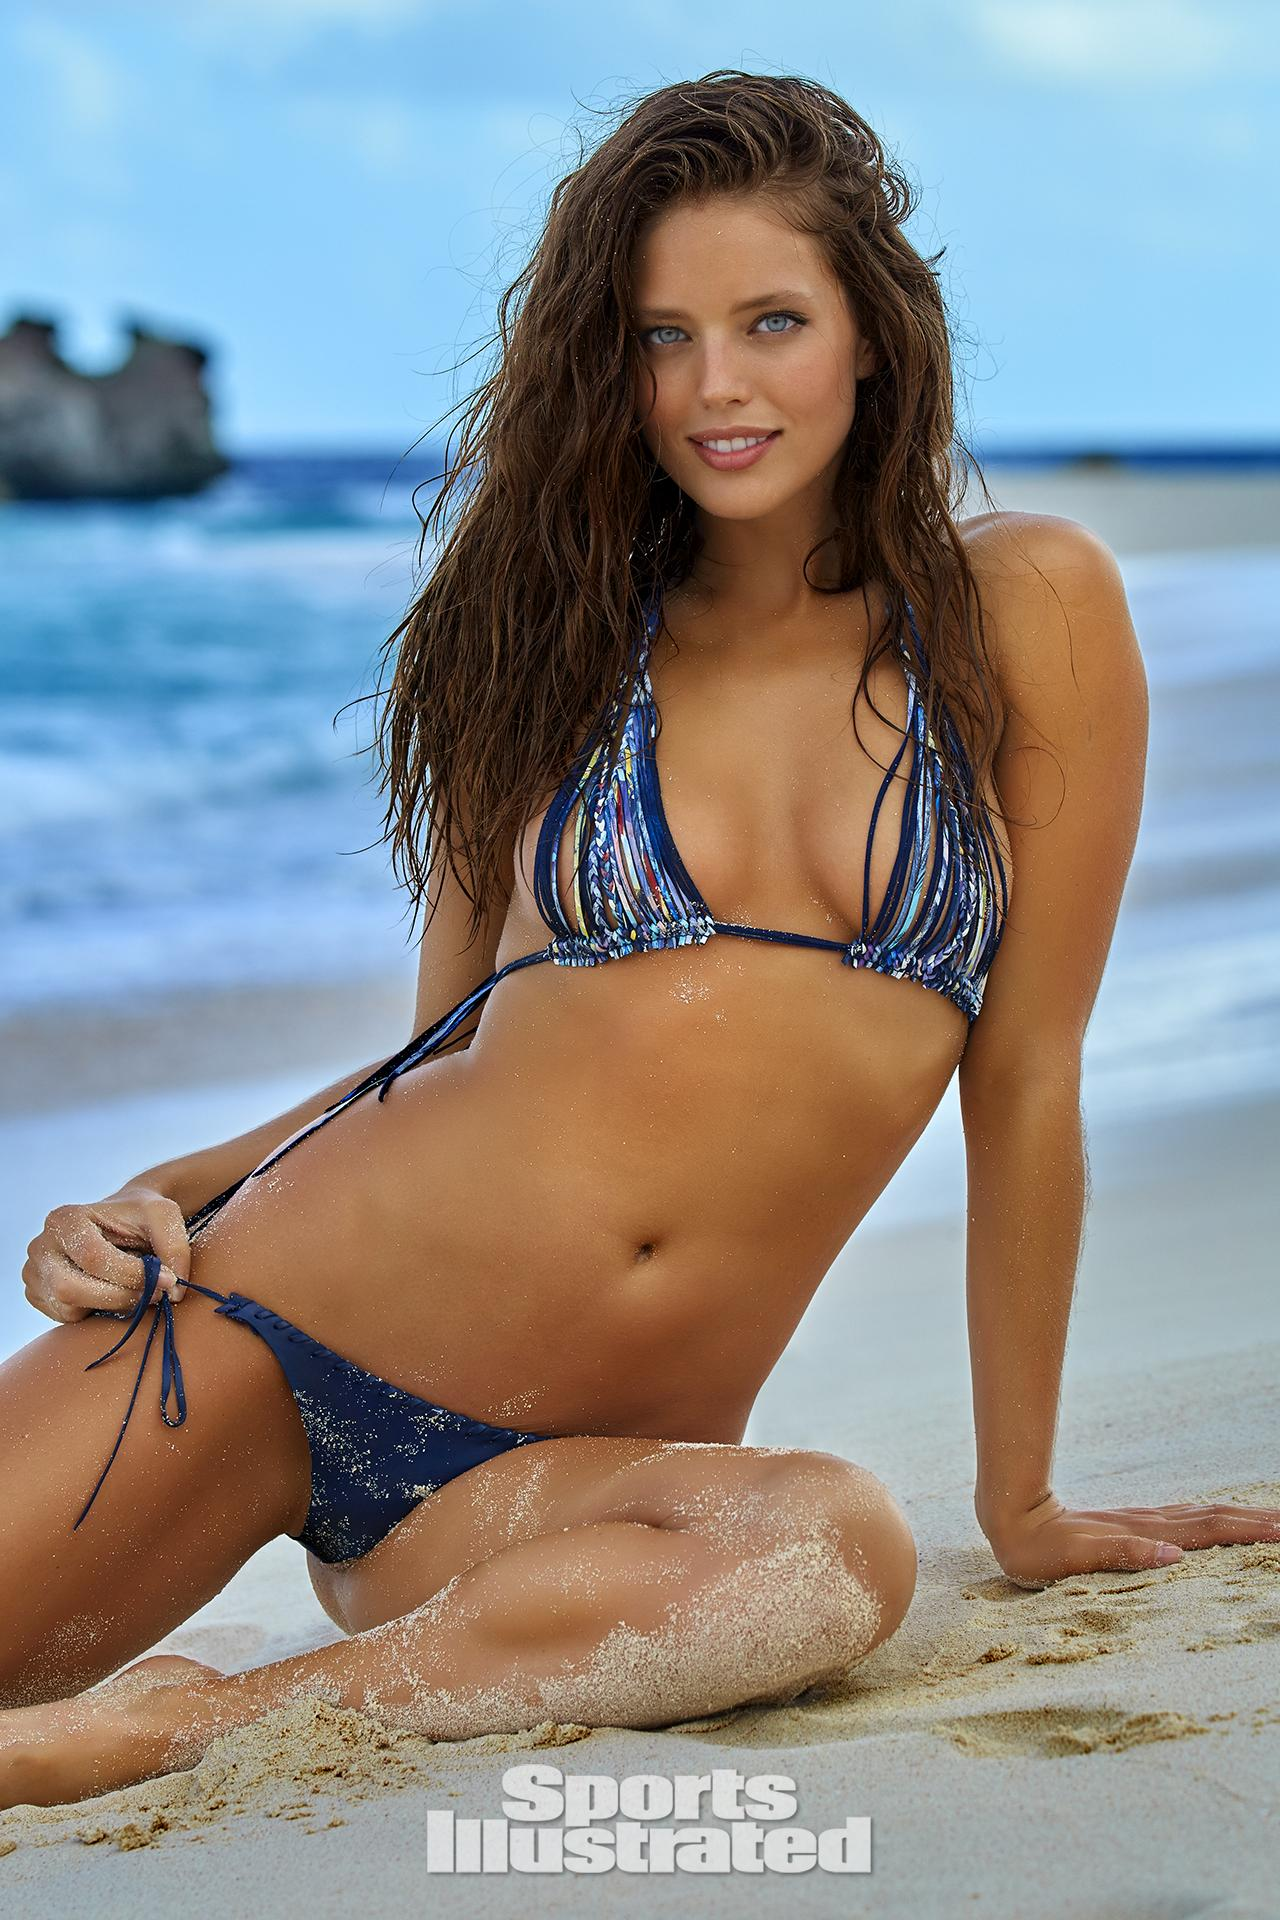 Happy 29th Birthday to SI Swimsuit babe Emily Didonato.